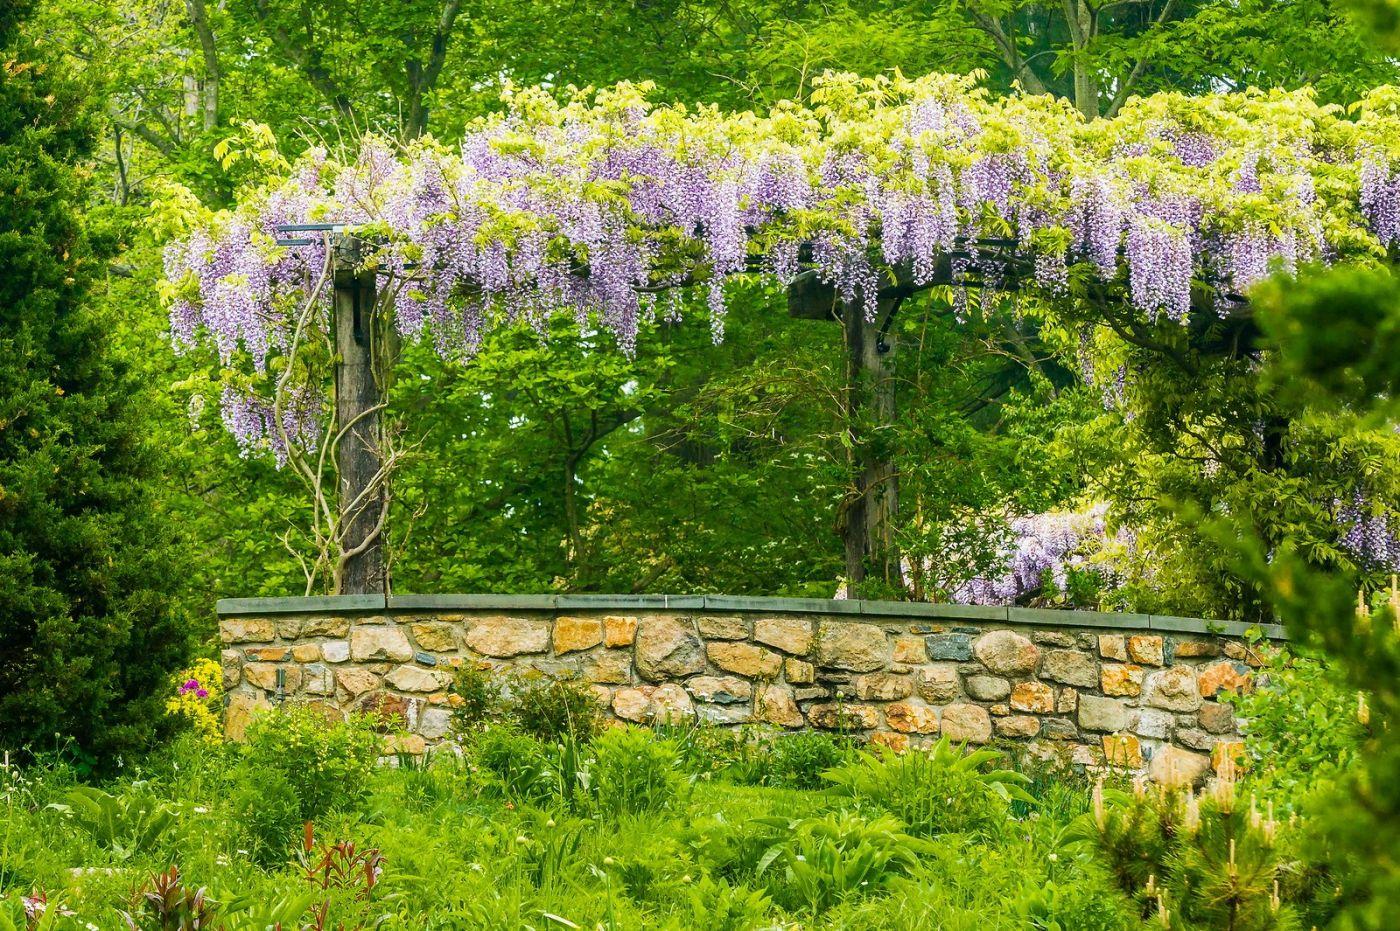 Chanticleer花园,那年盛开的紫藤花_图1-10